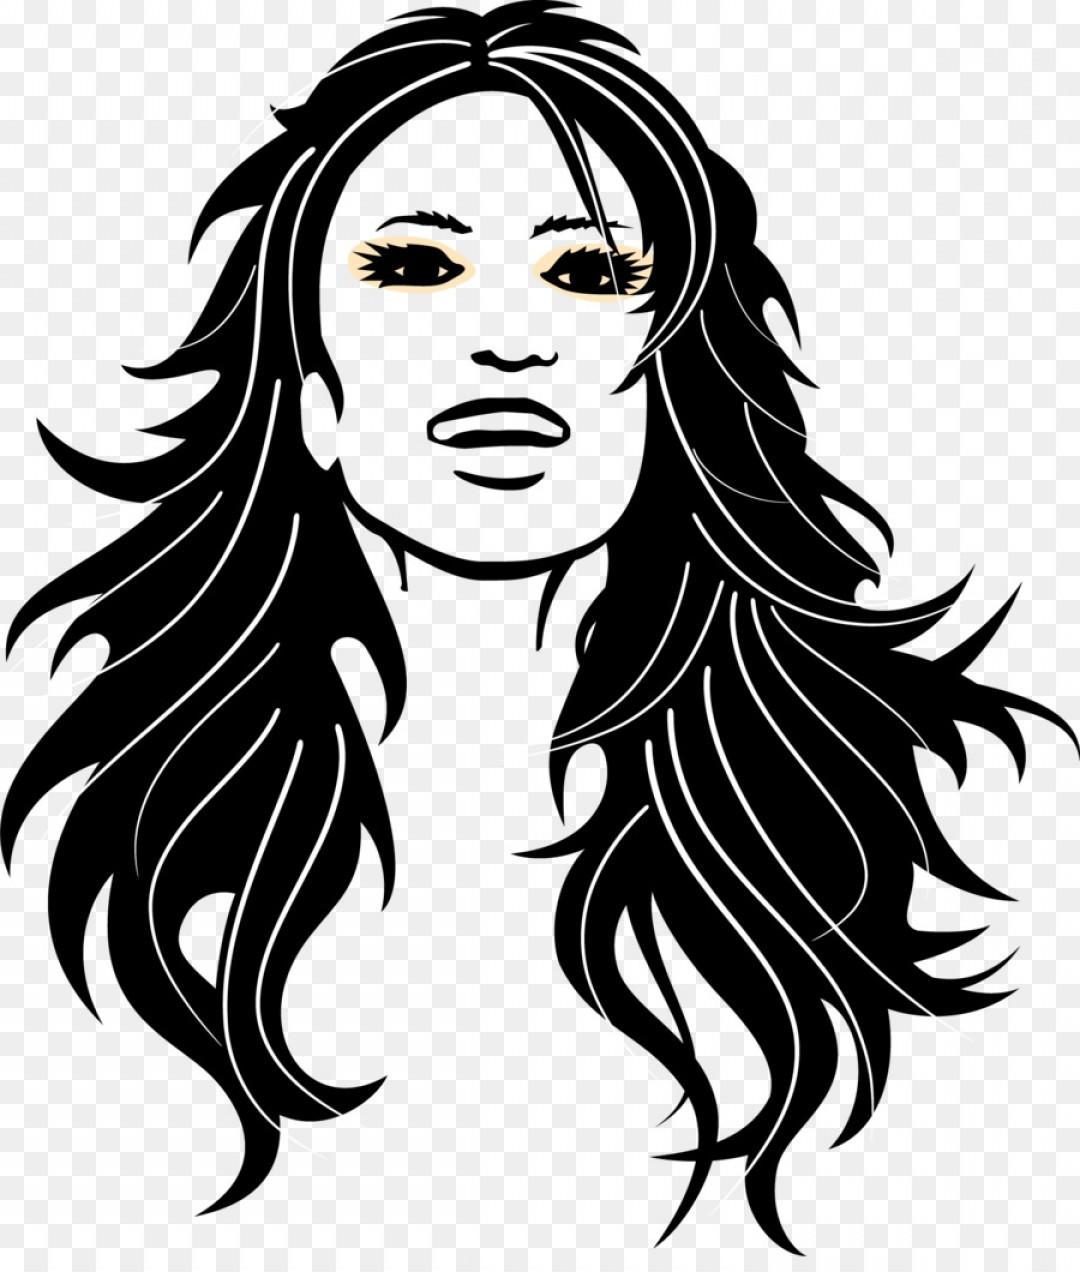 1080x1272 Png Long Hair Woman Beauty Parlour Clip Art European S Shopatcloth